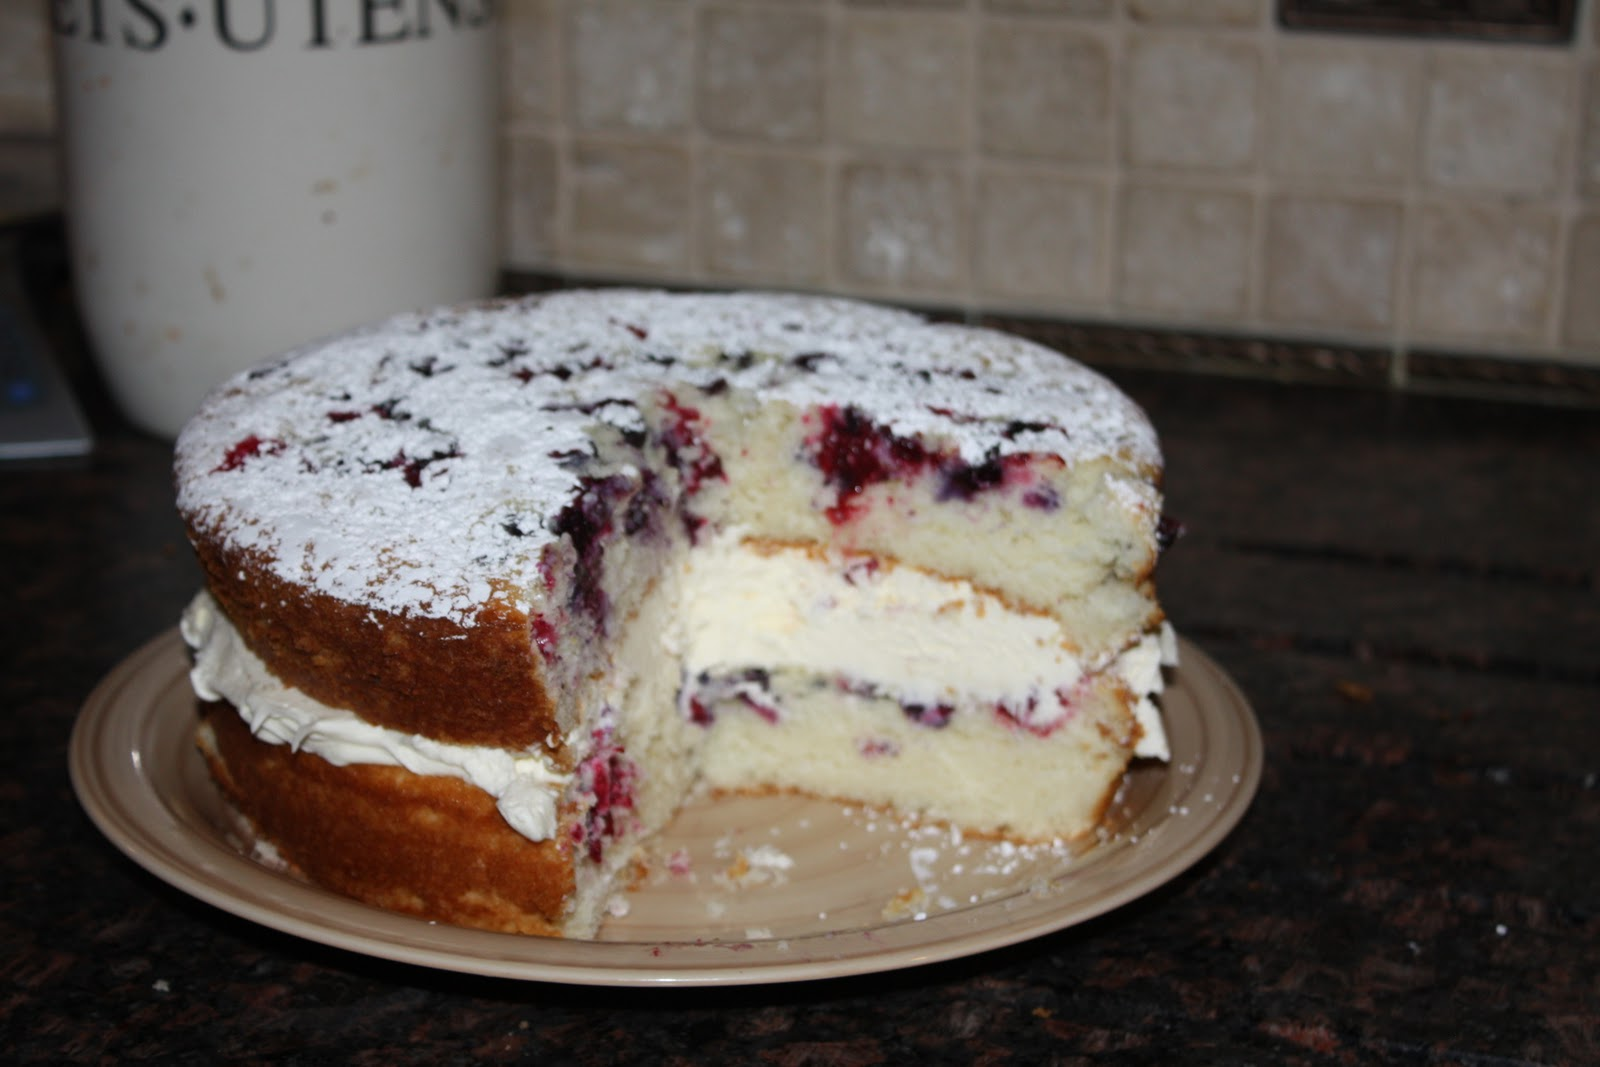 ... Cupcake's Kitchen: Lemon Berry Cake filled with Mascarpone filling